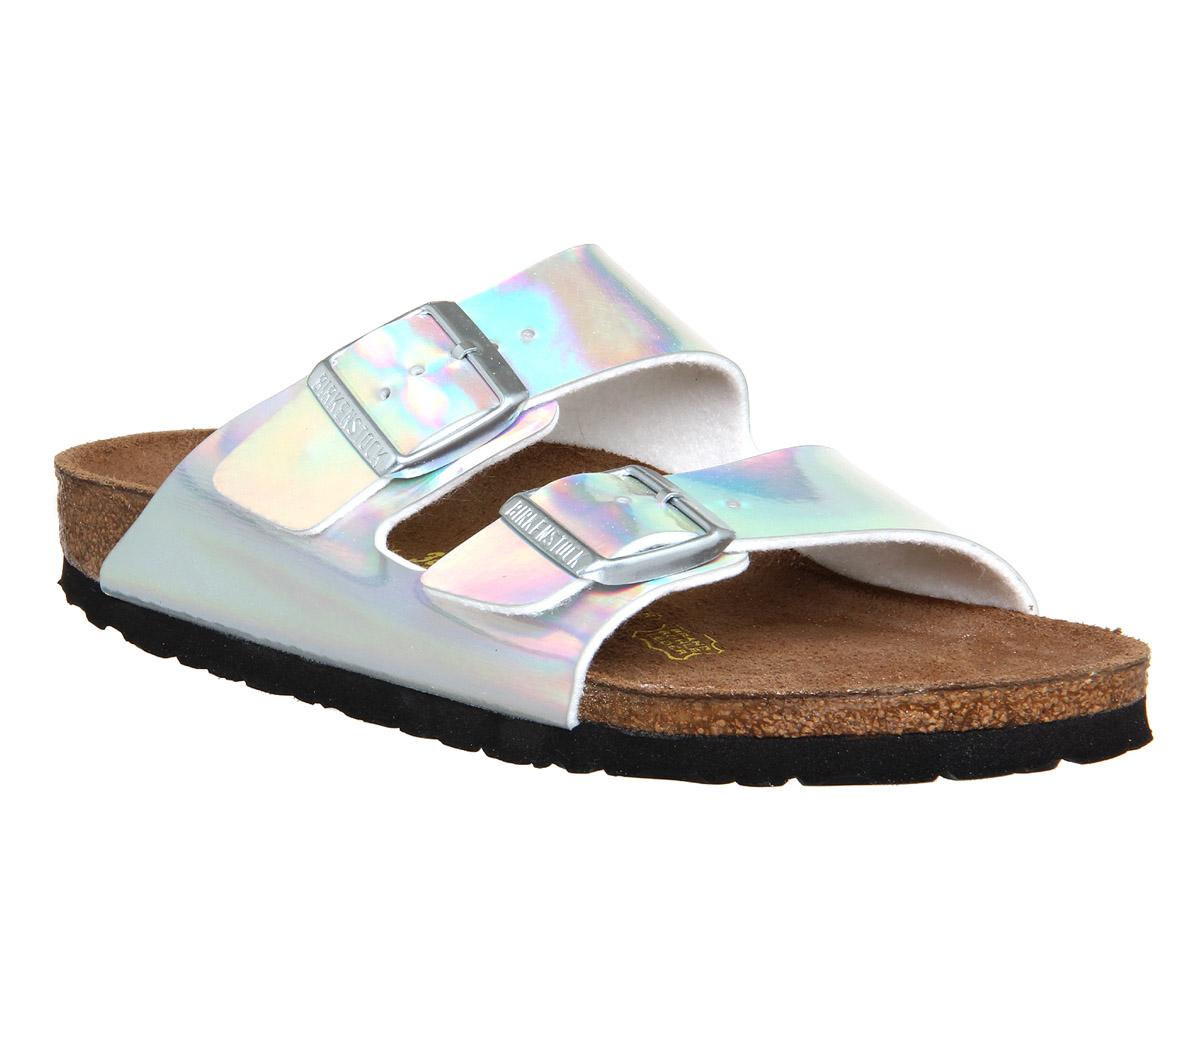 Womens Birkenstock Arizona Two Strap SILVER MIRROR EXCLUSIVE Sandals